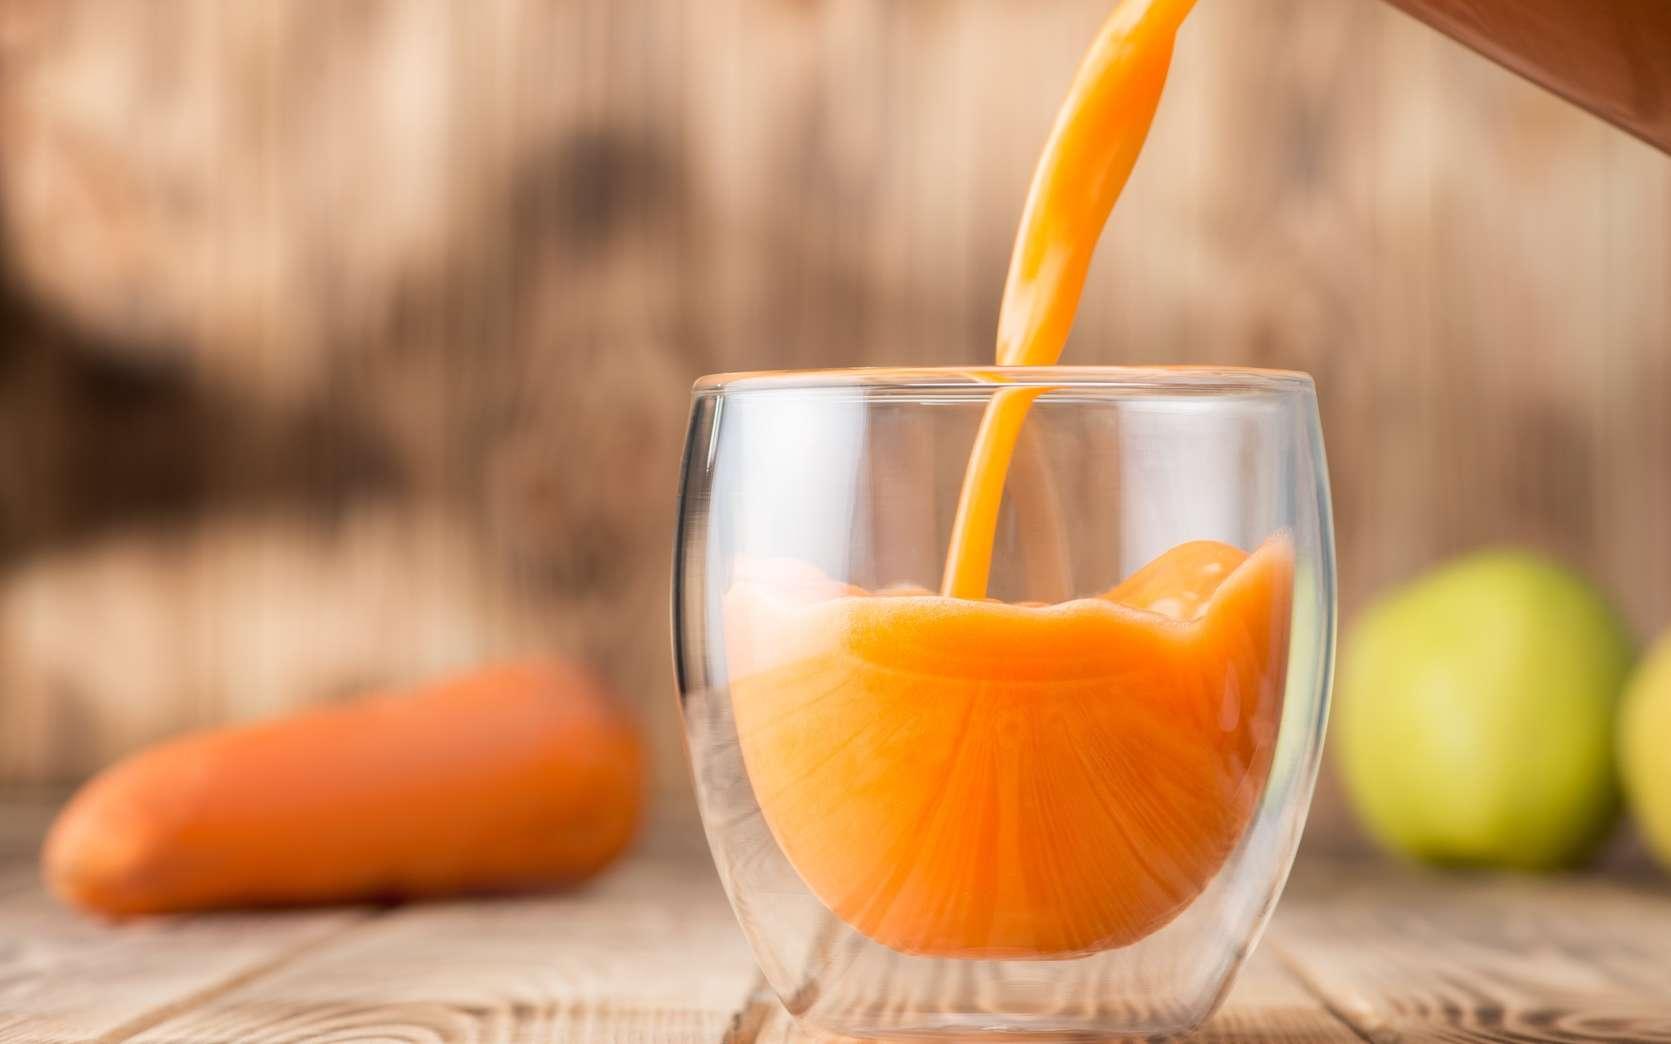 La carotte est riche en carotènes. © olegkruglyak3, Fotolia